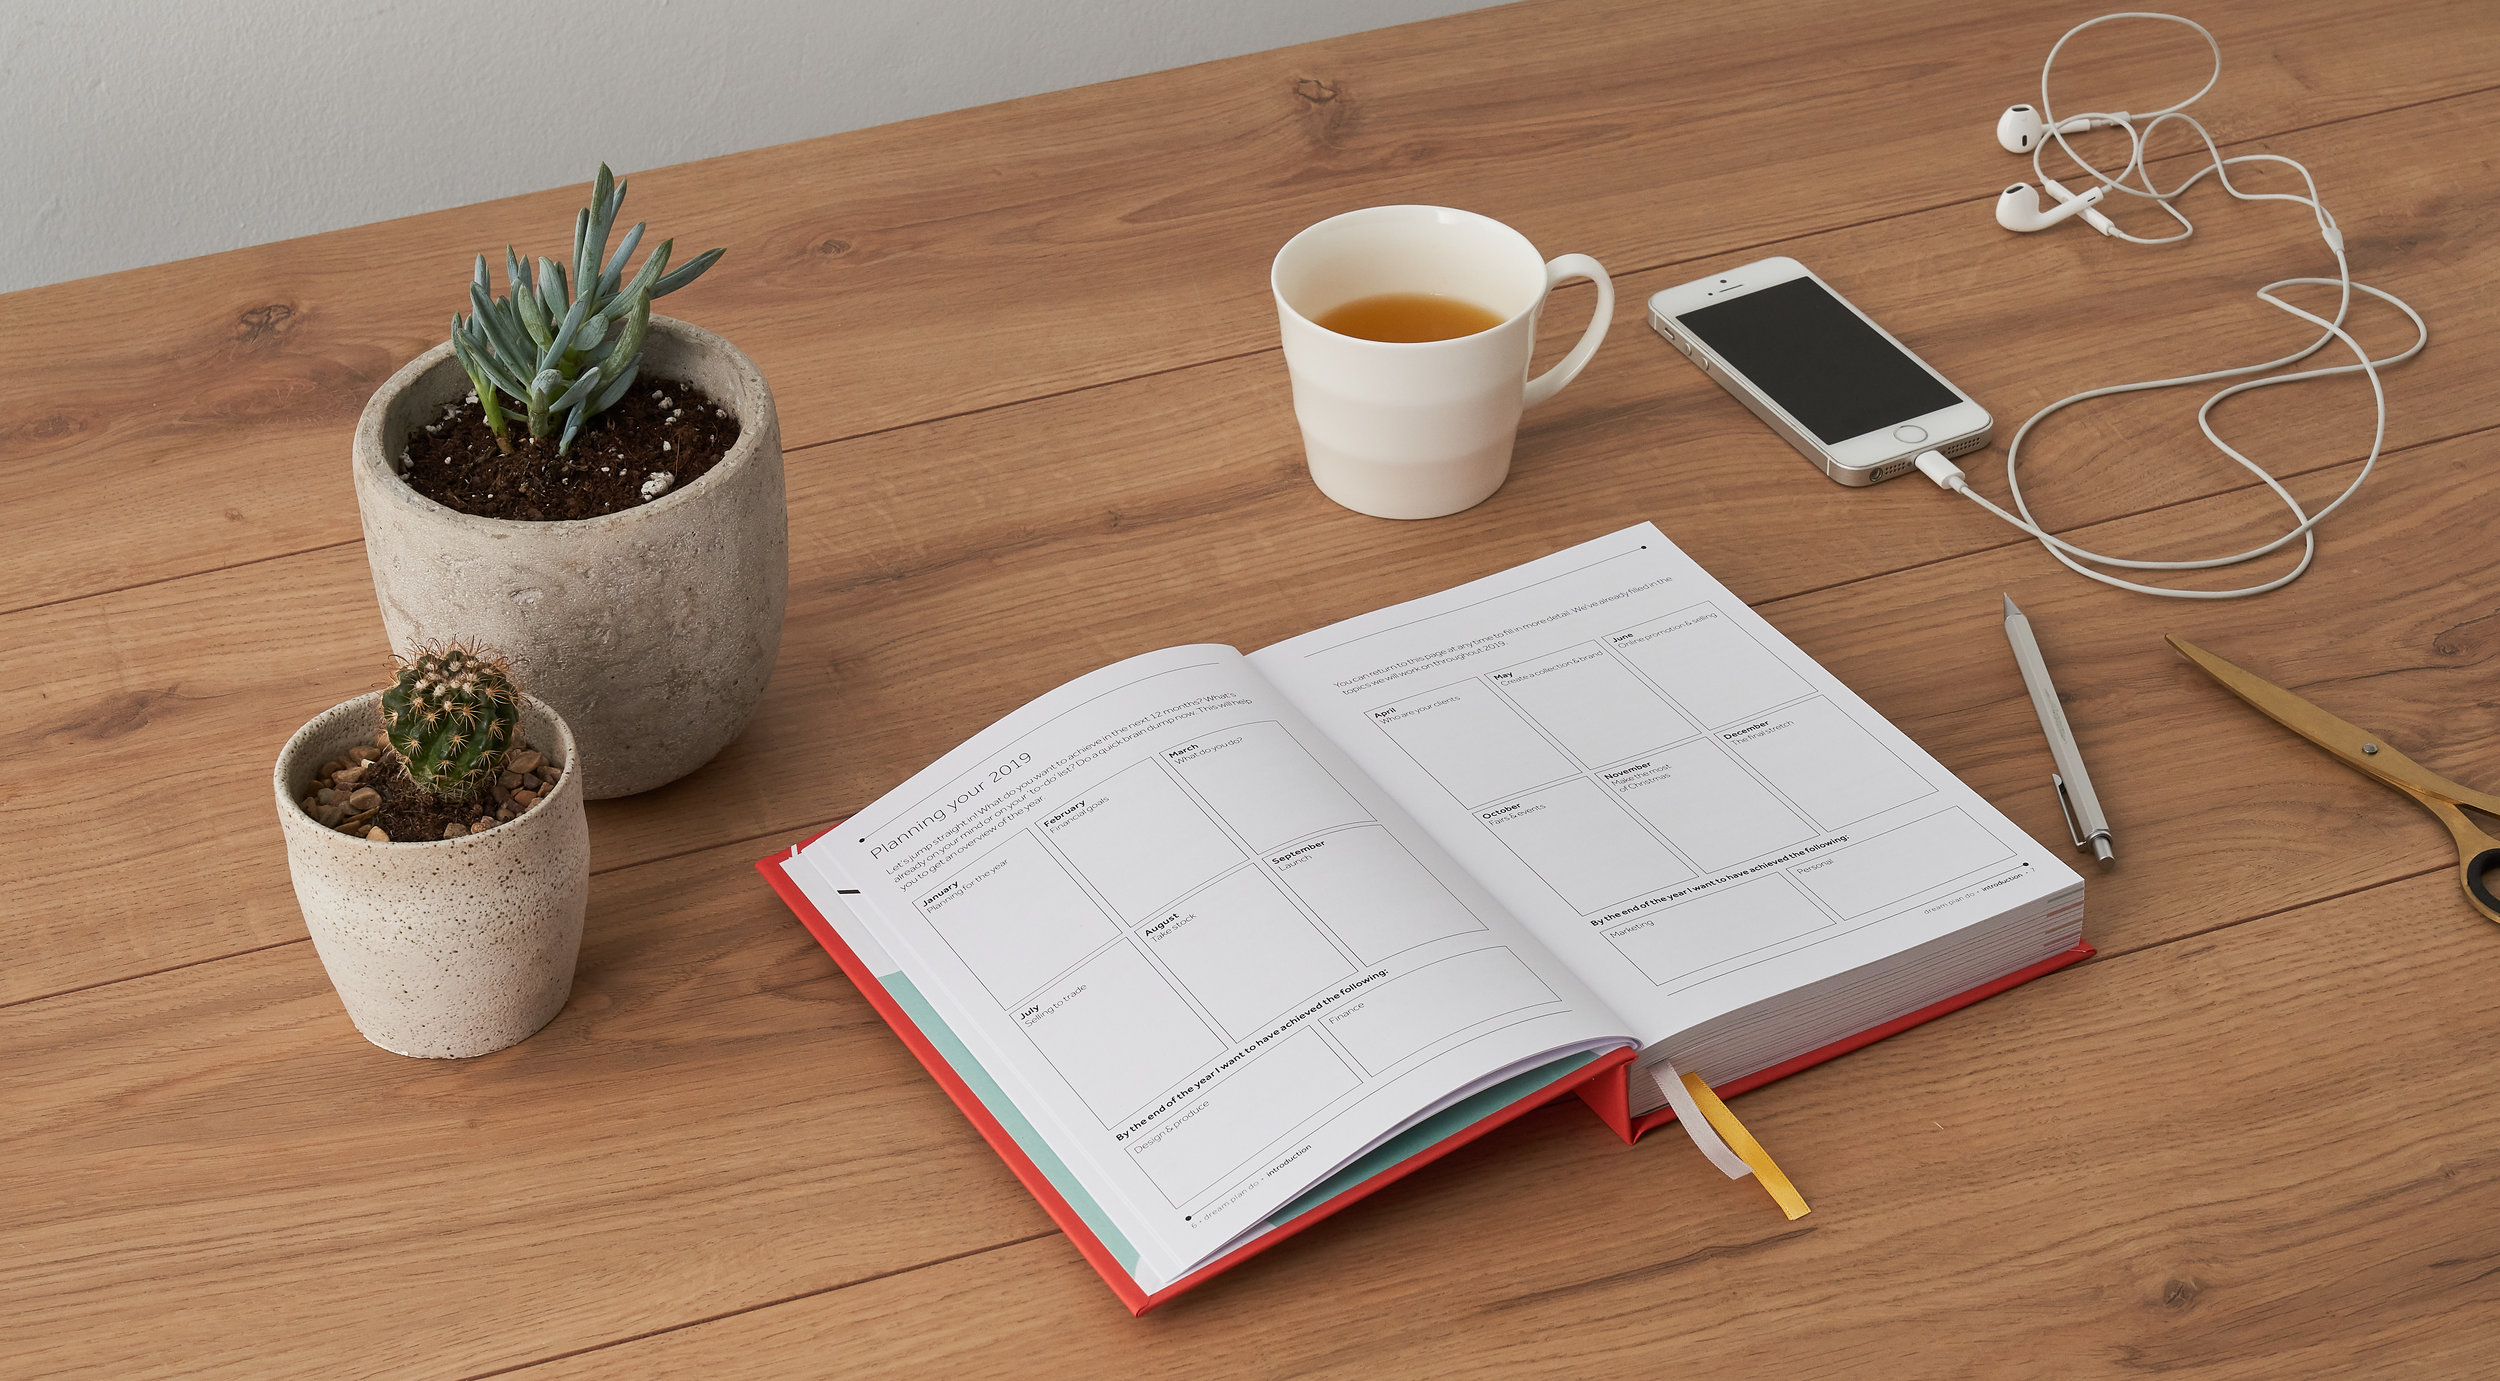 Dream-Plan-Do-Planning Your 2019.jpg